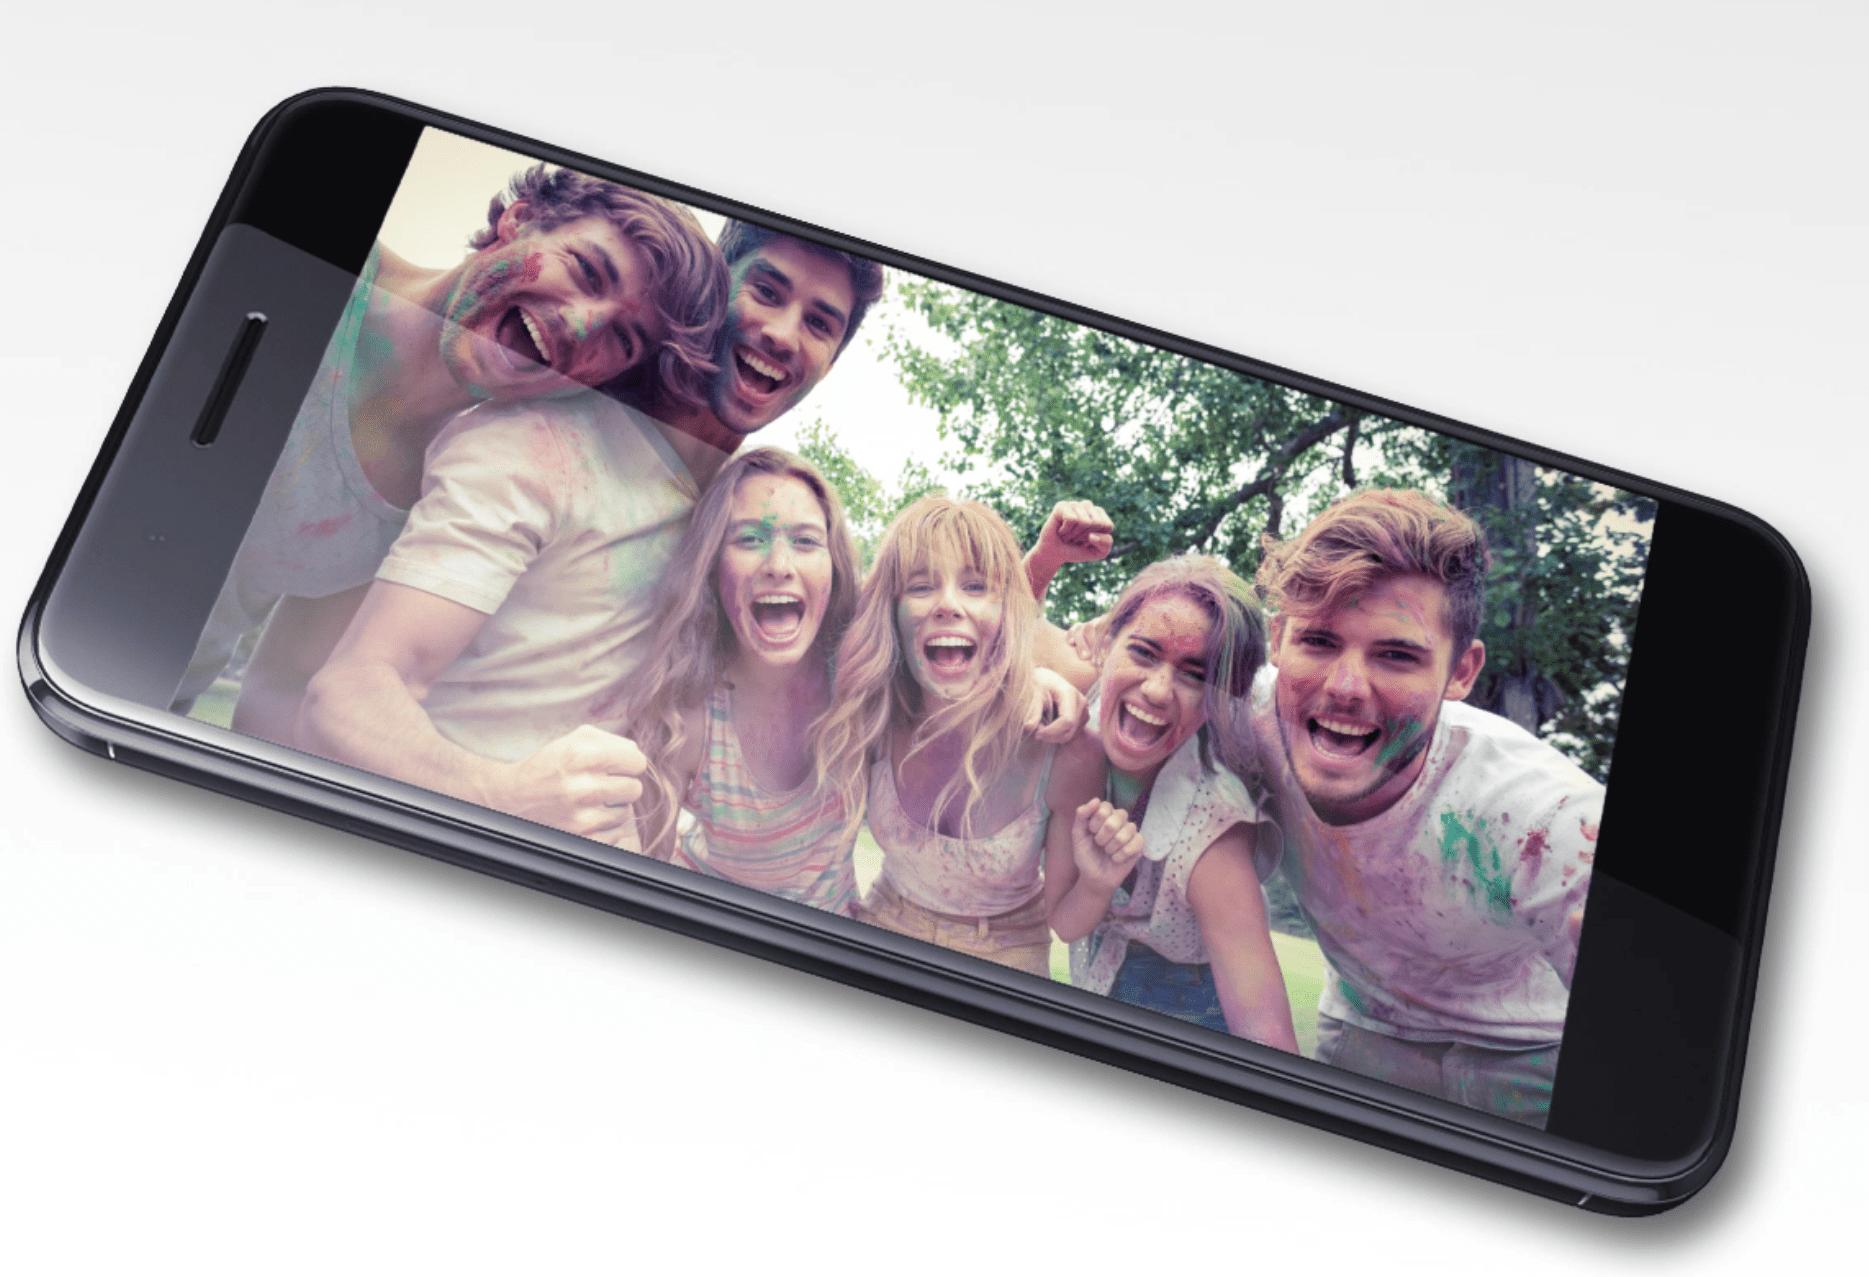 HTC One X10 smartphone.